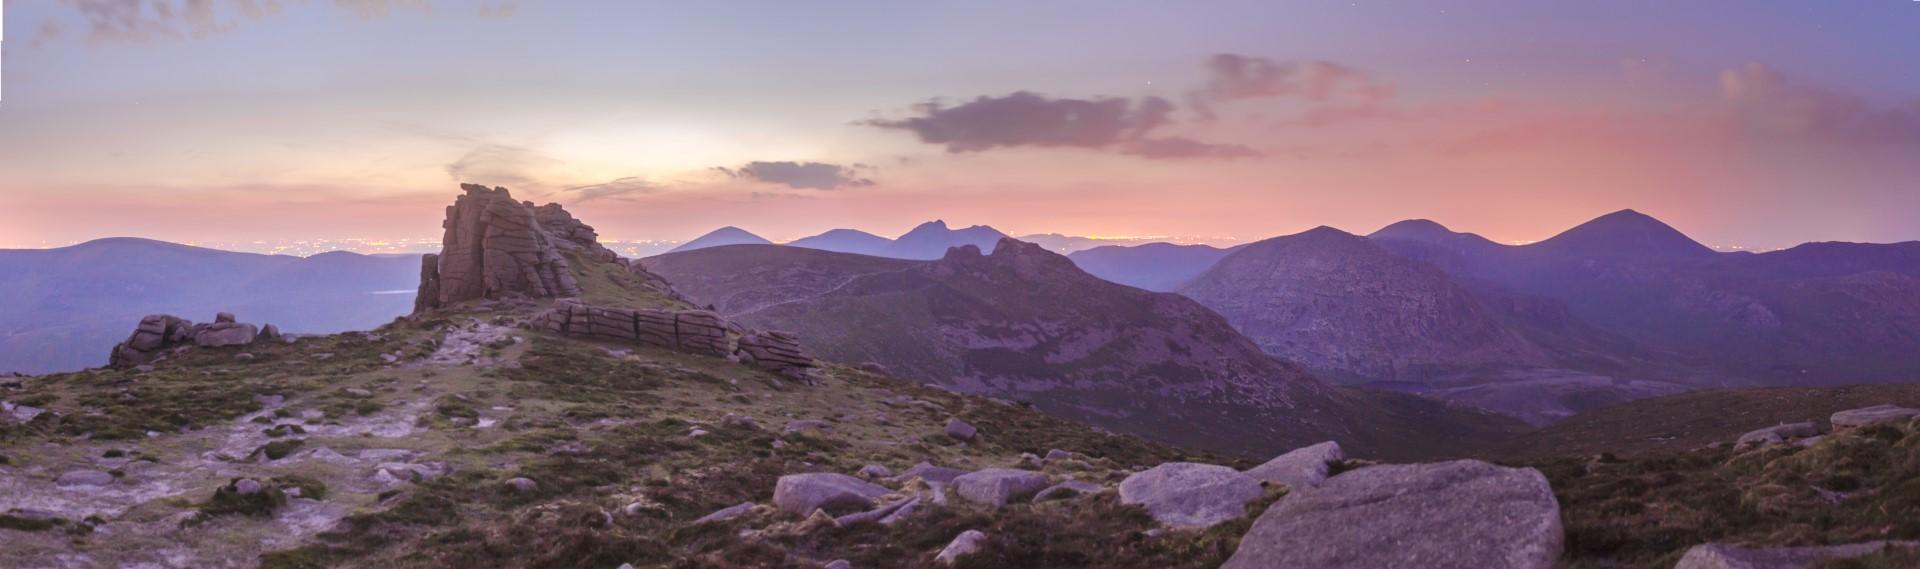 Twilight on top of Slieve Binnian at around 11.30 pm